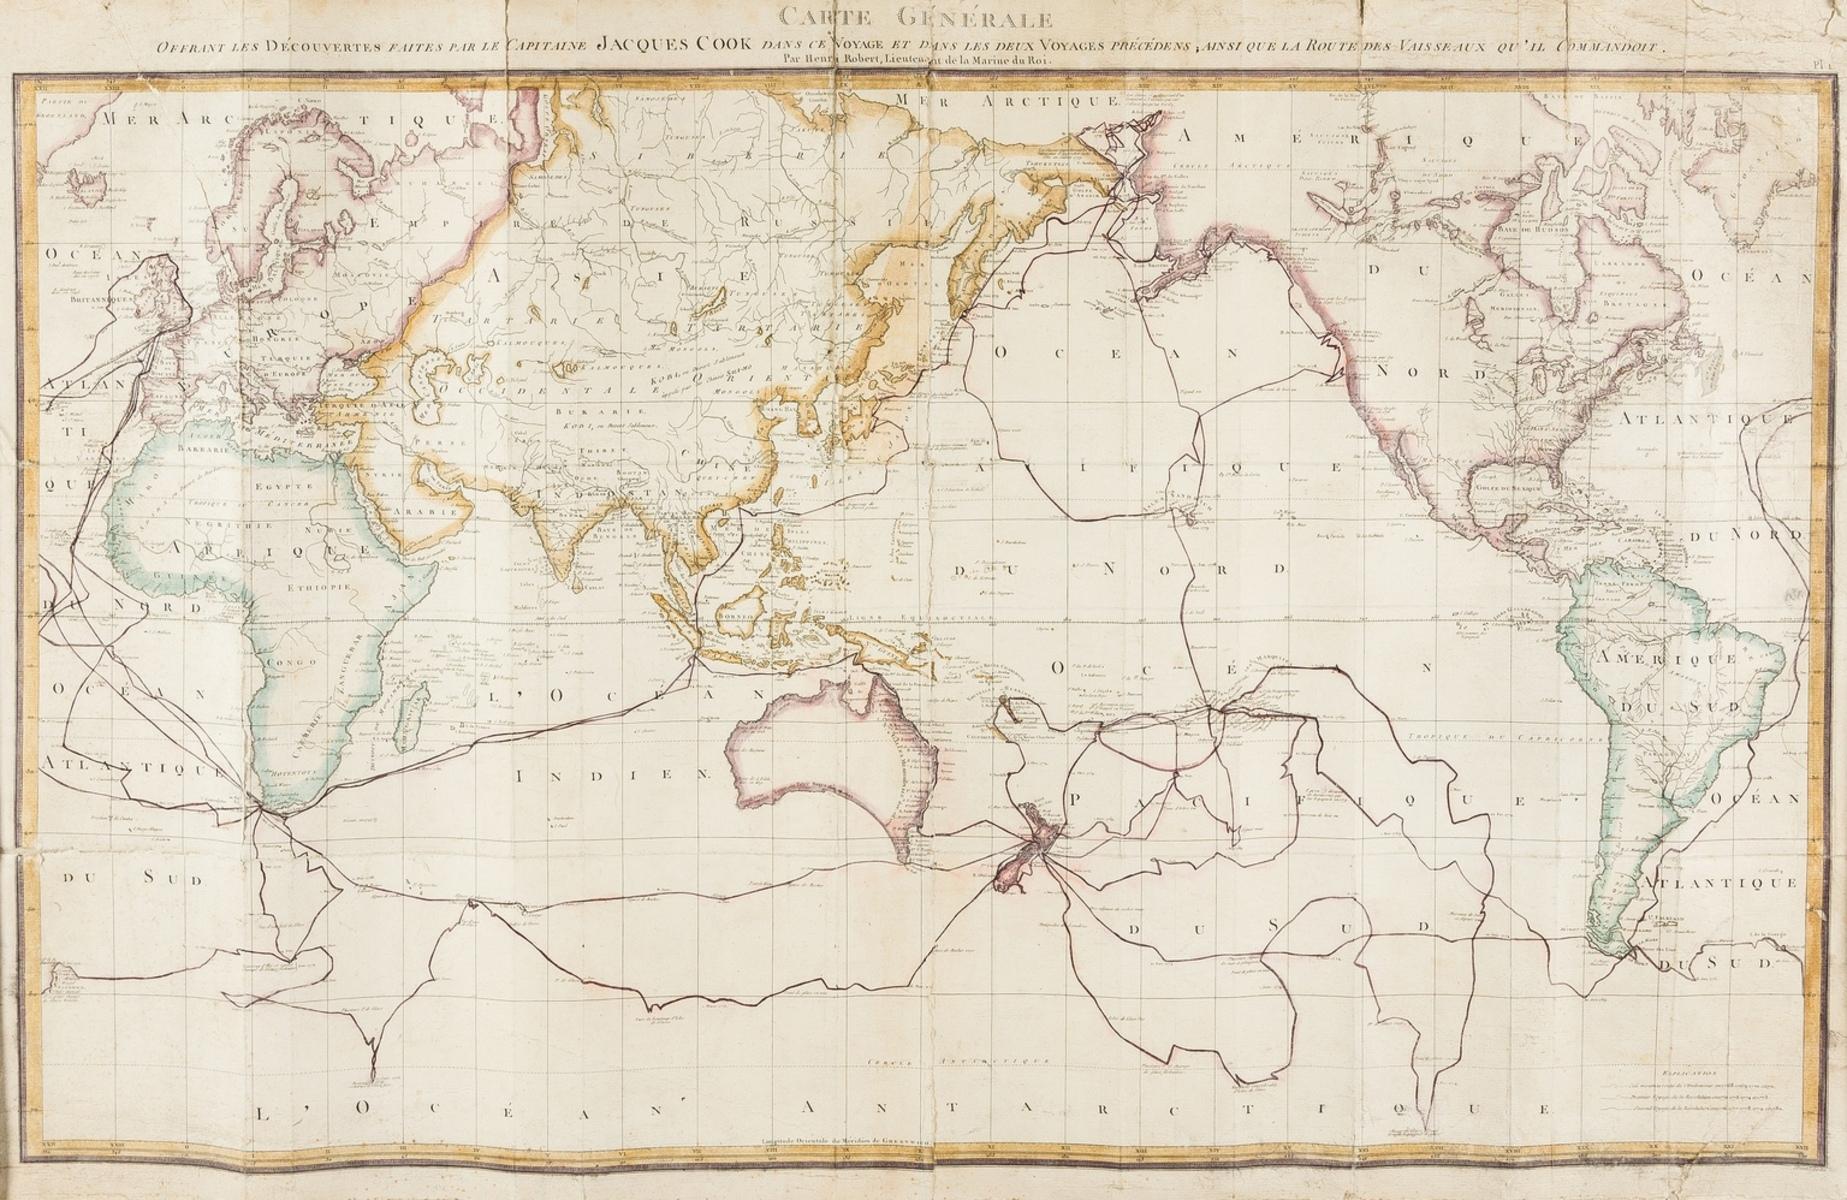 World.- Cook's Voyages.- Roberts (Lieut. Henry) & Robert Benard. Carte Generale Offrant Les …